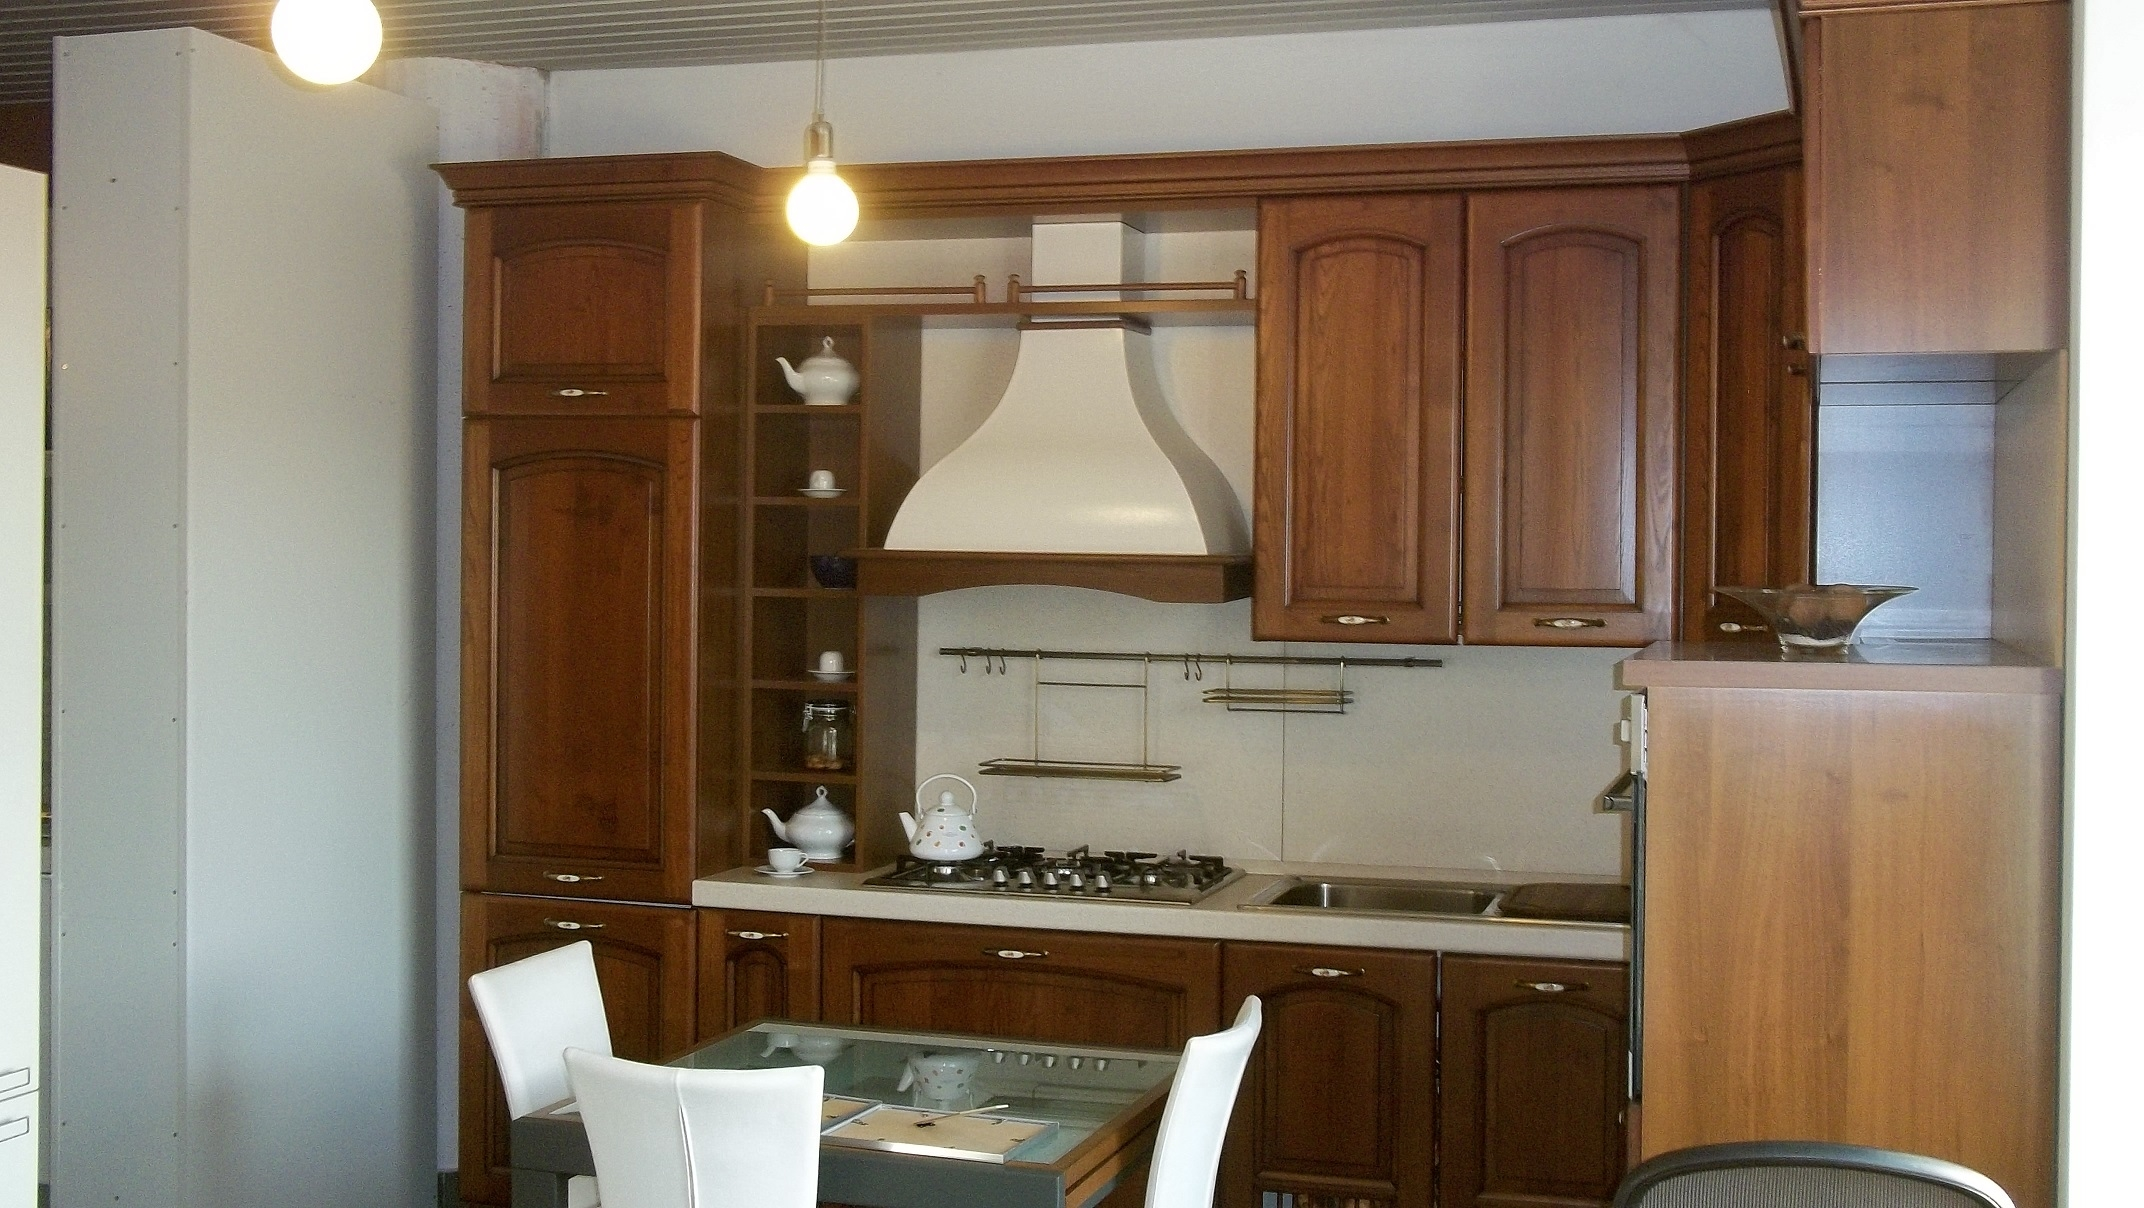 Cucina classica legno massello scontata 50 europlak for Pittura per cucina classica